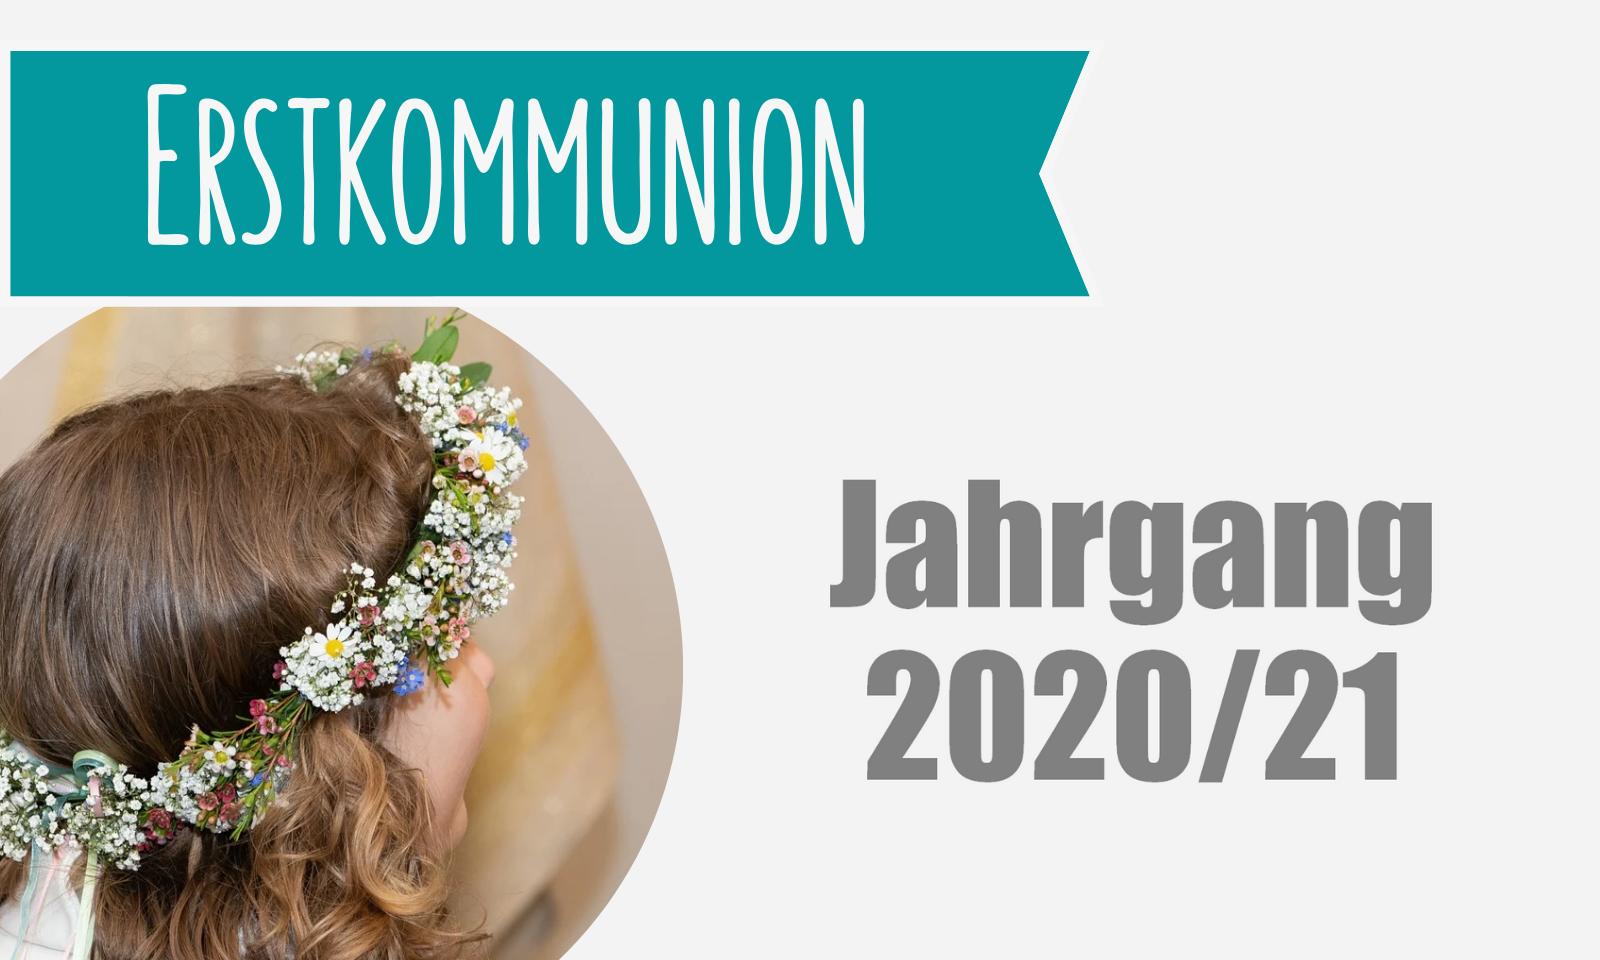 Erstkommunion Symbolbild2020 21